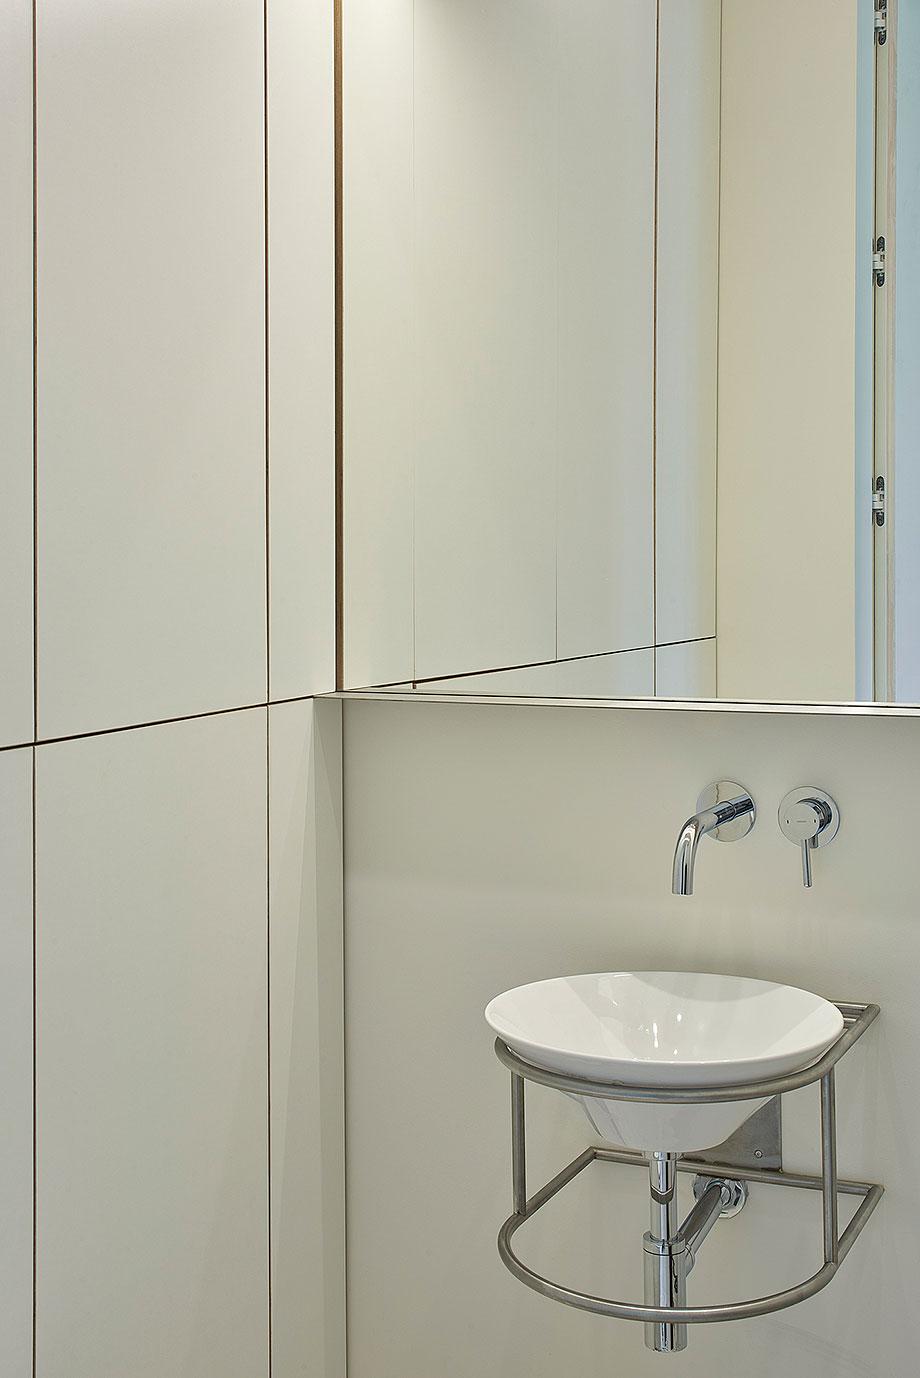 apartamento en vilna de sarkauskai architecture atelier (12) - foto darius petrulaitis